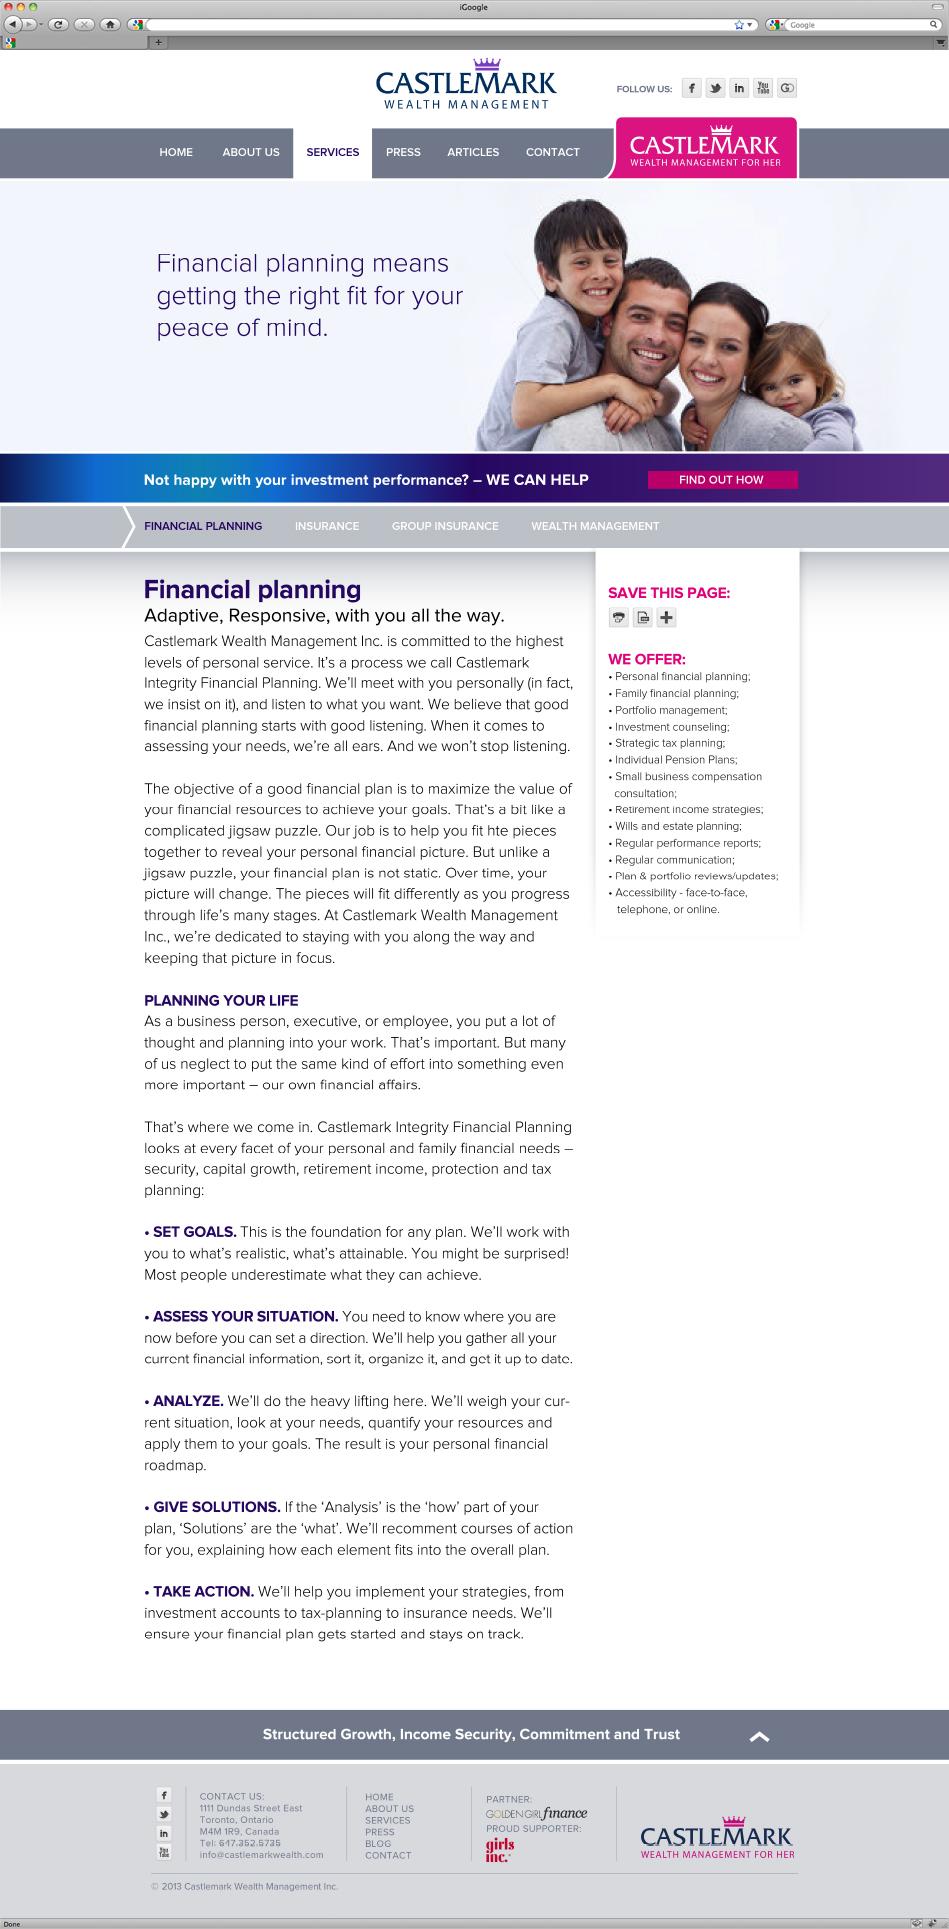 Castlemark Wealth Management website interface